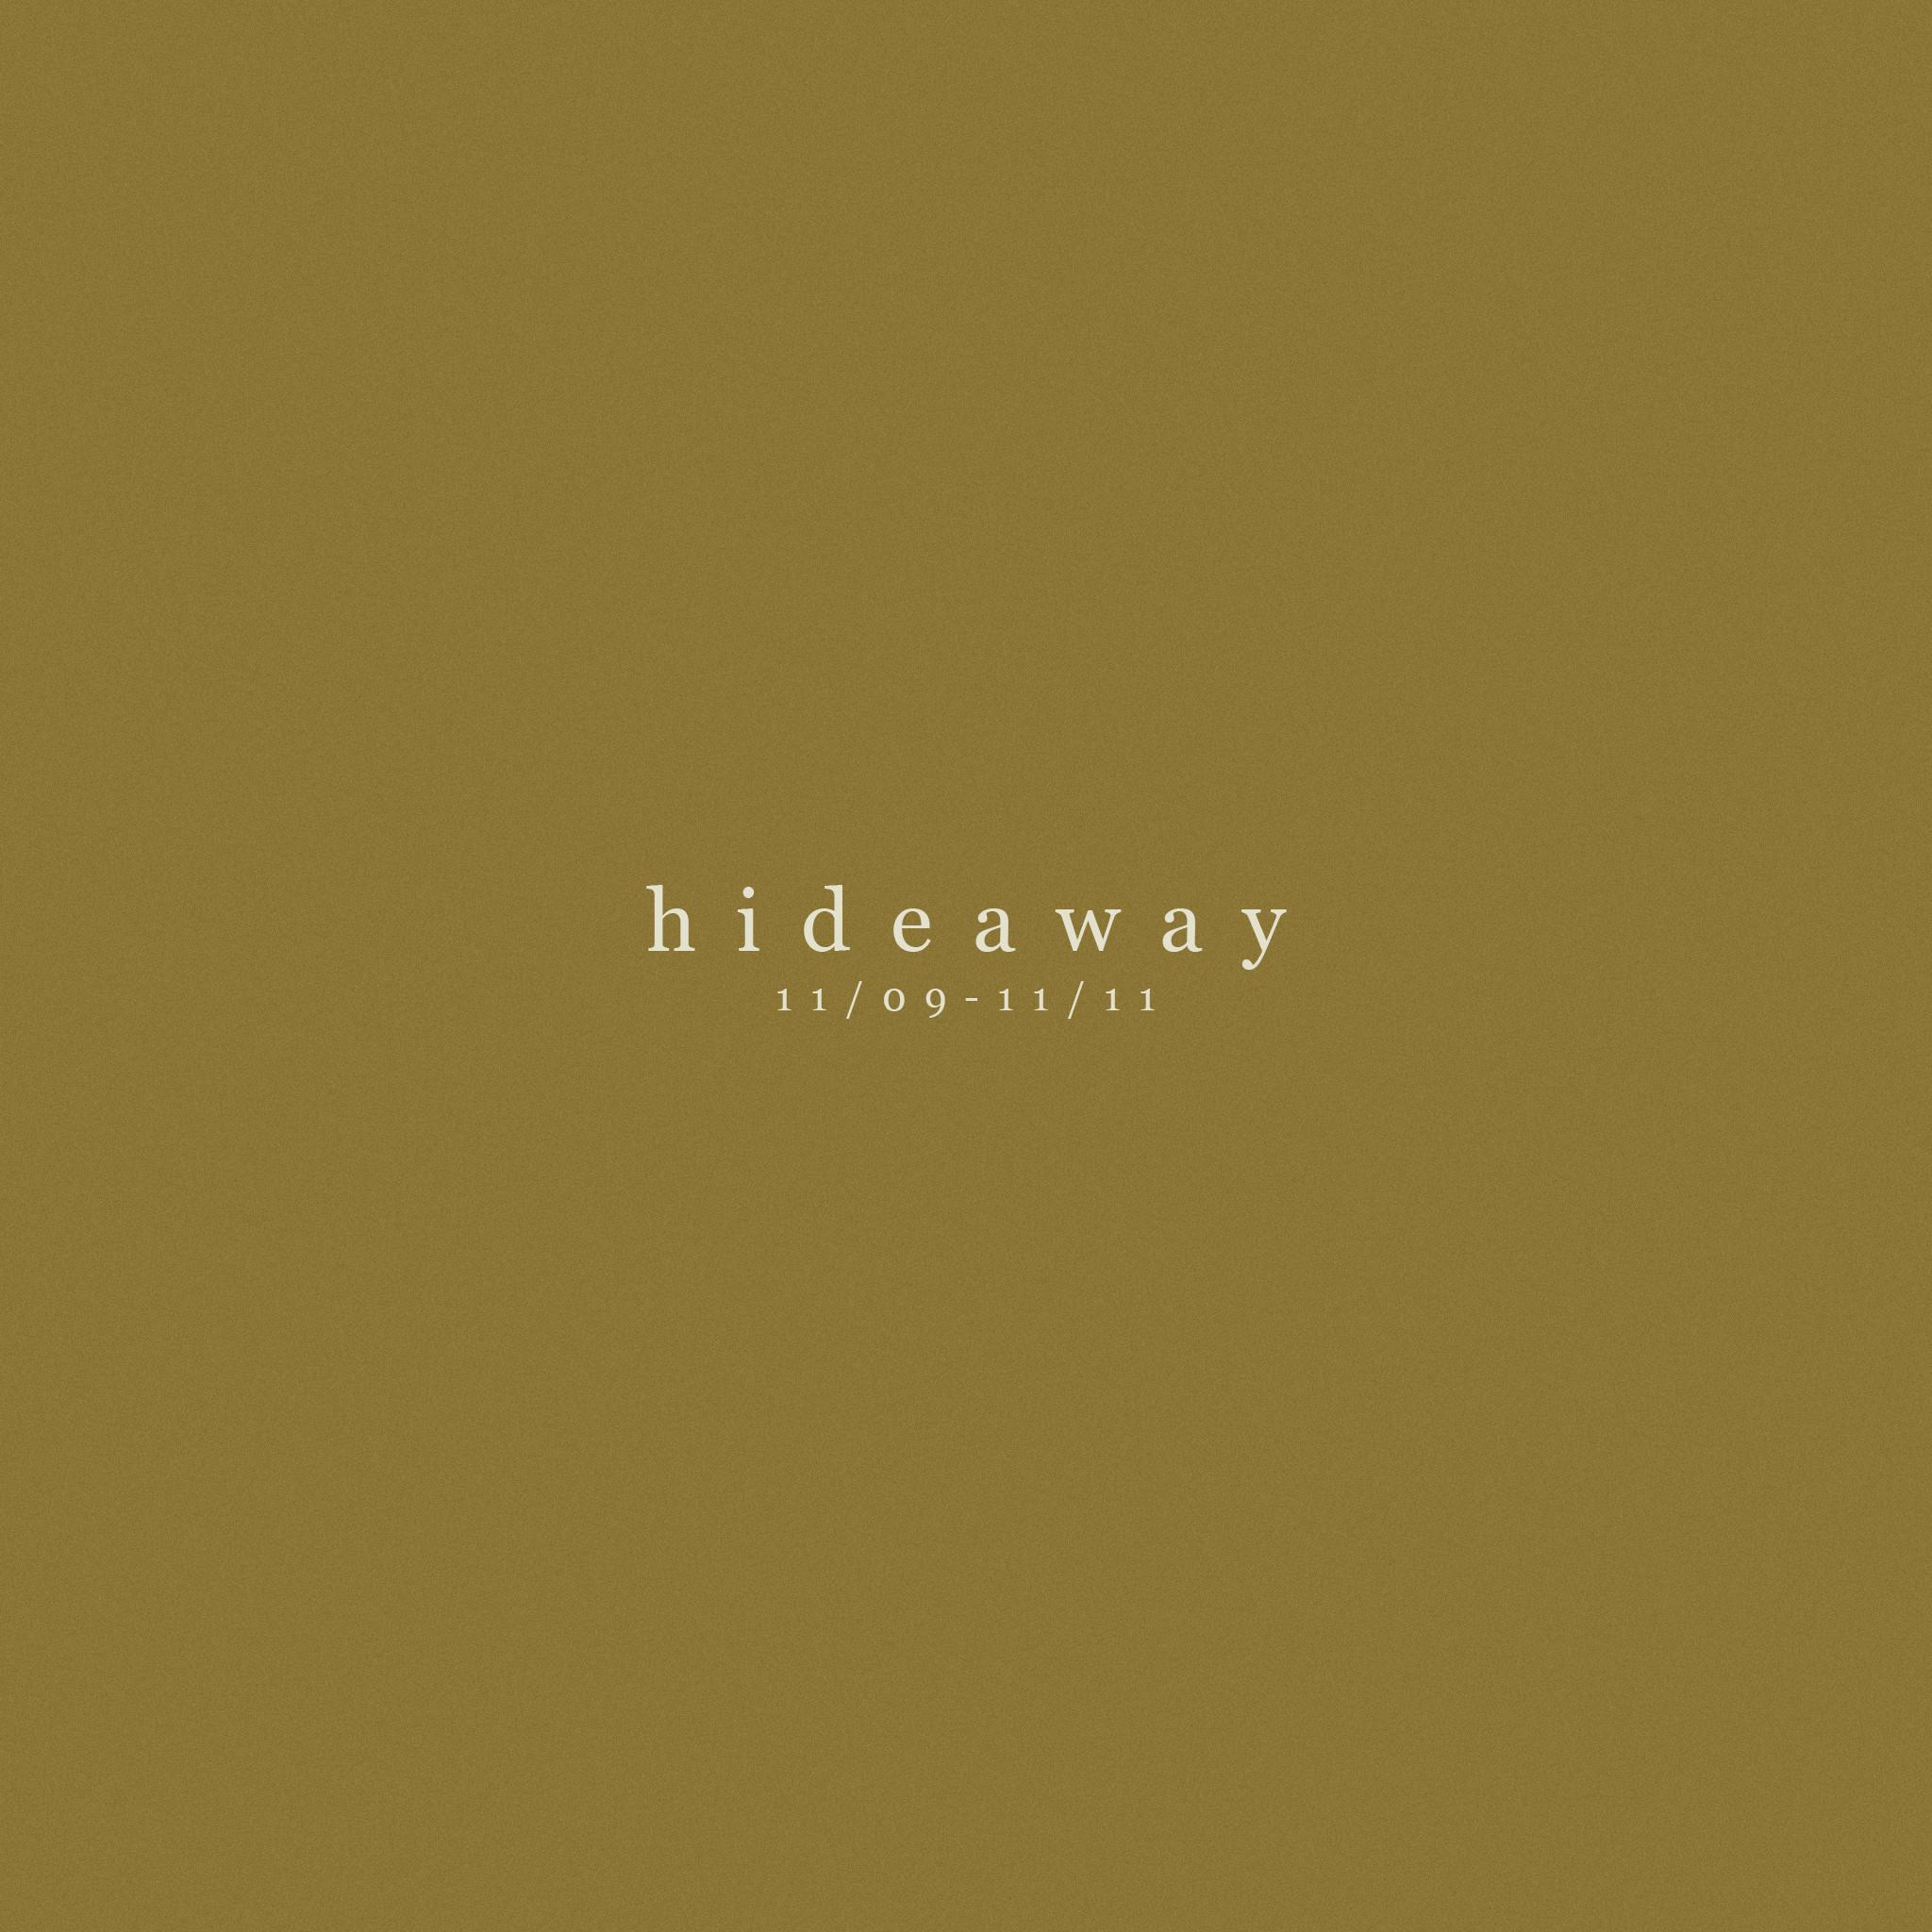 hideaway   photography retreat